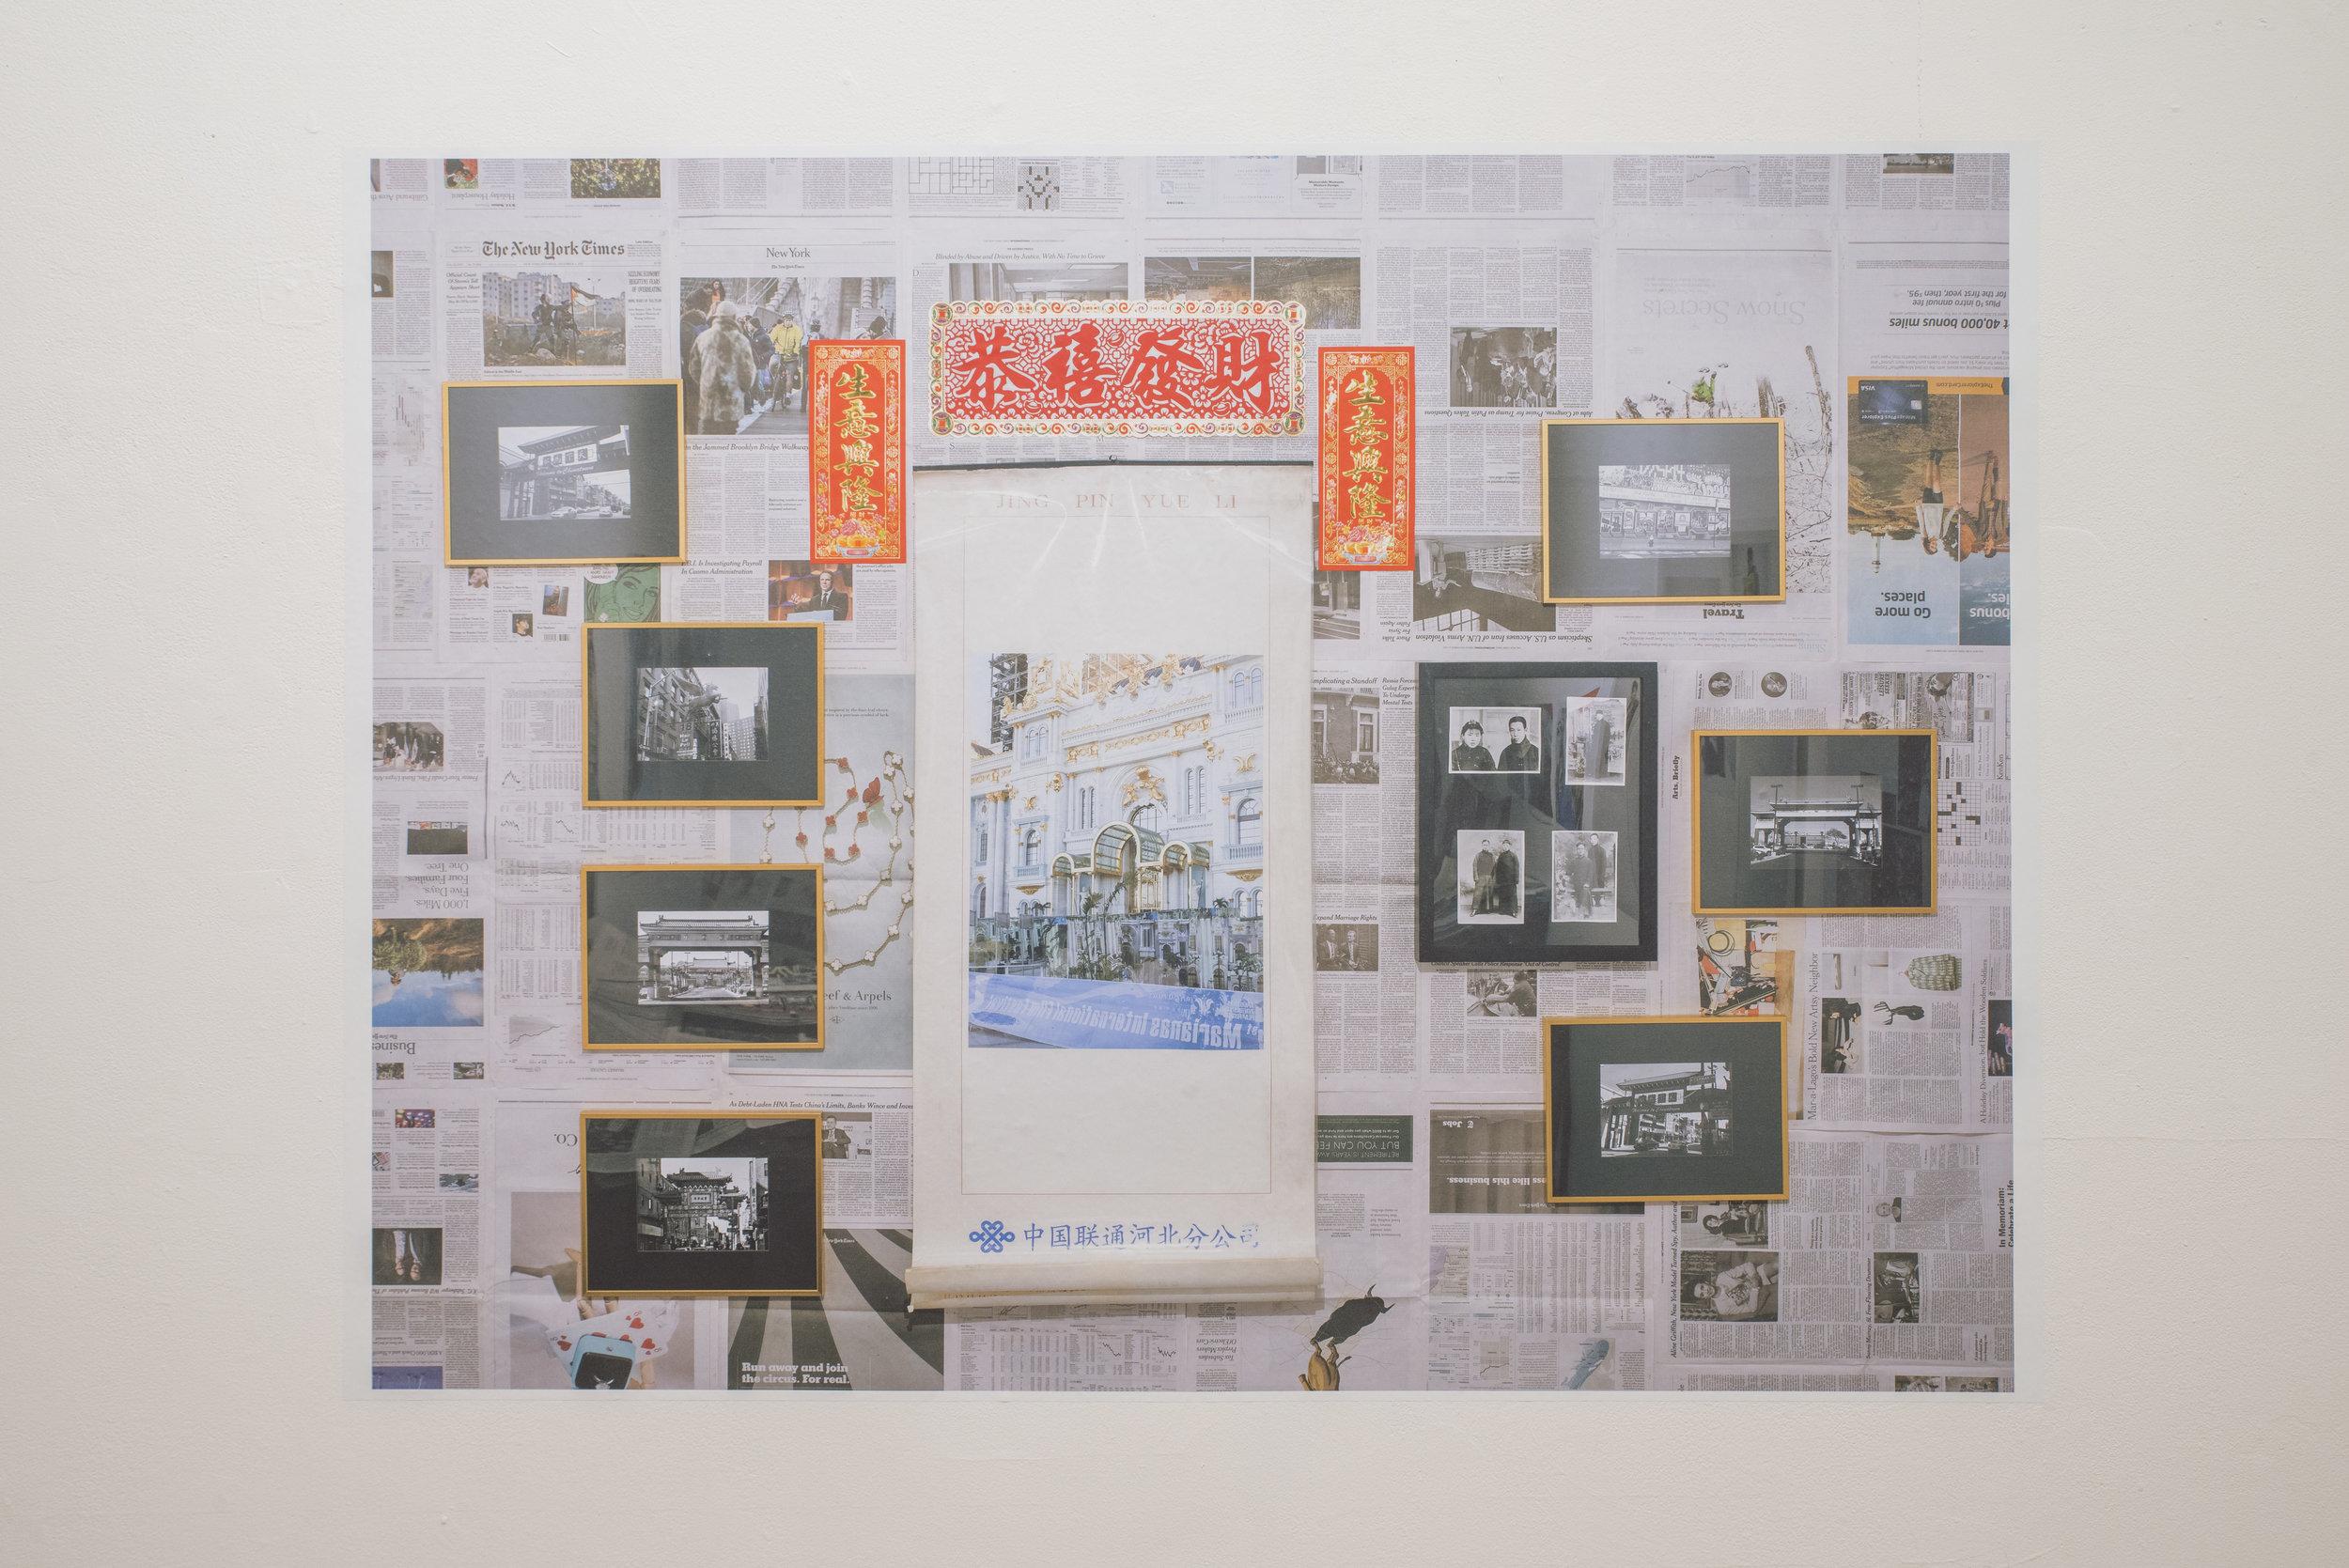 Zhao, Jiawei_wallpaper_installation_2.jpg